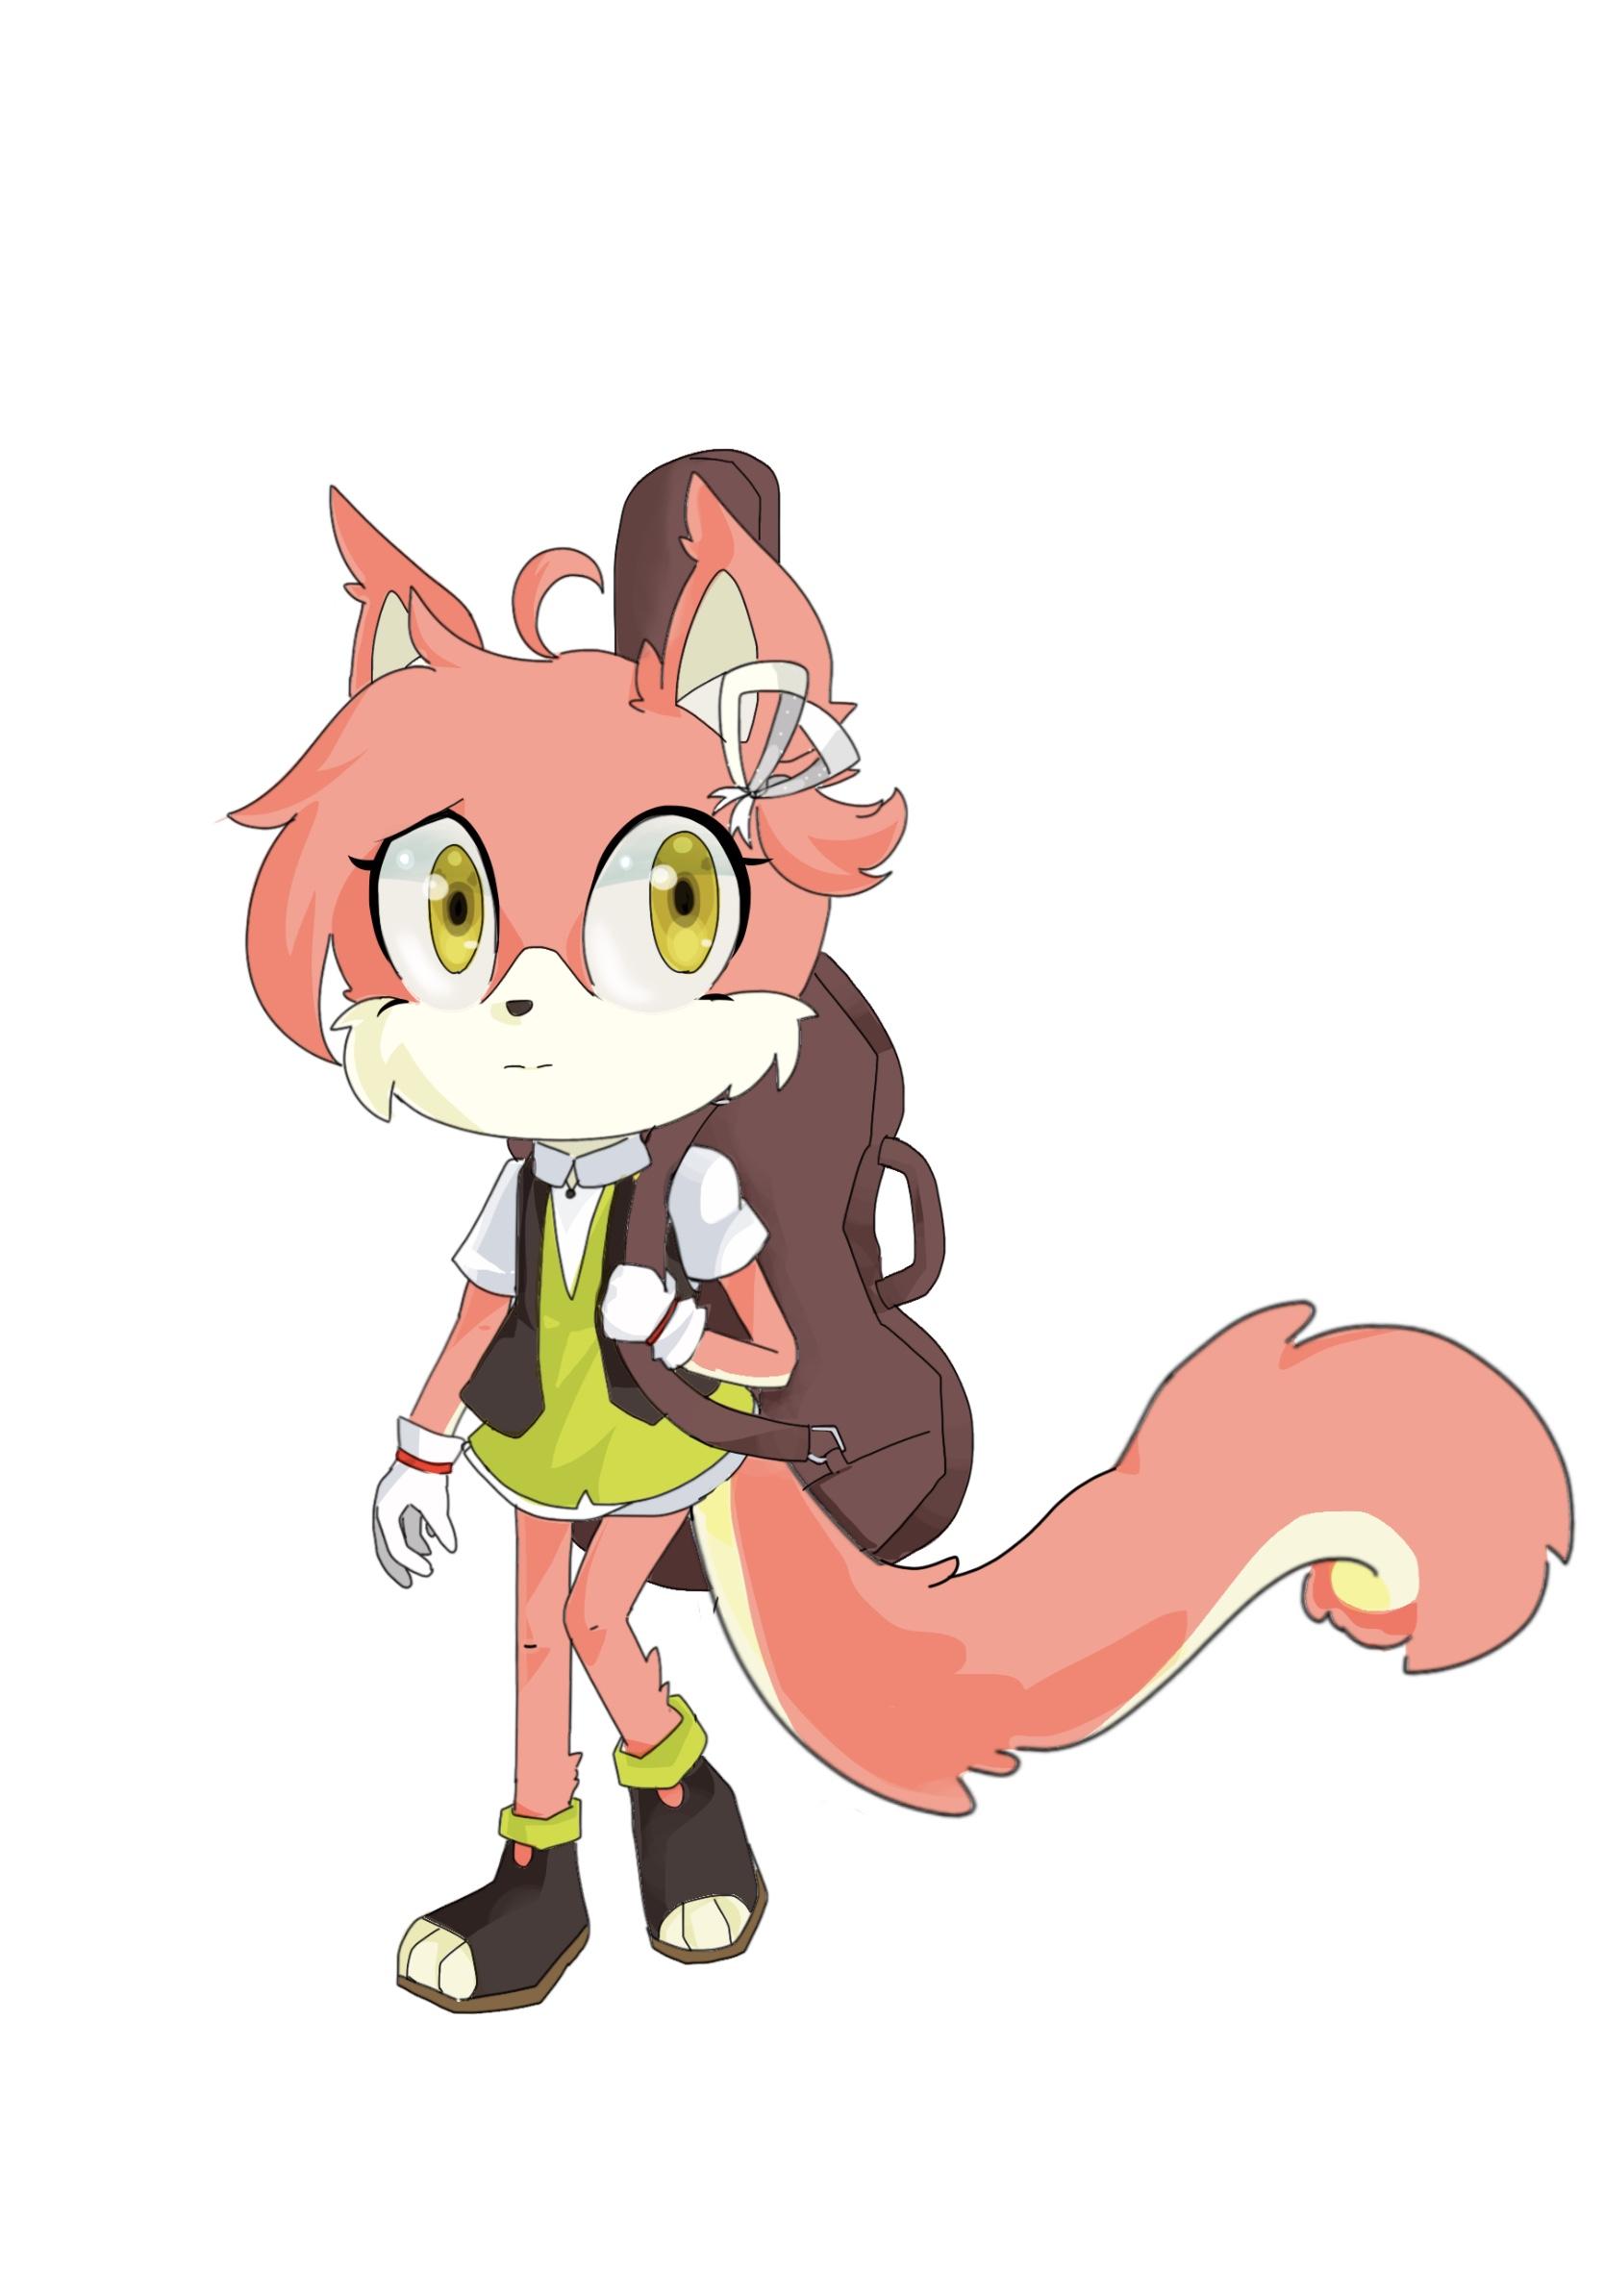 Shira the squirrel